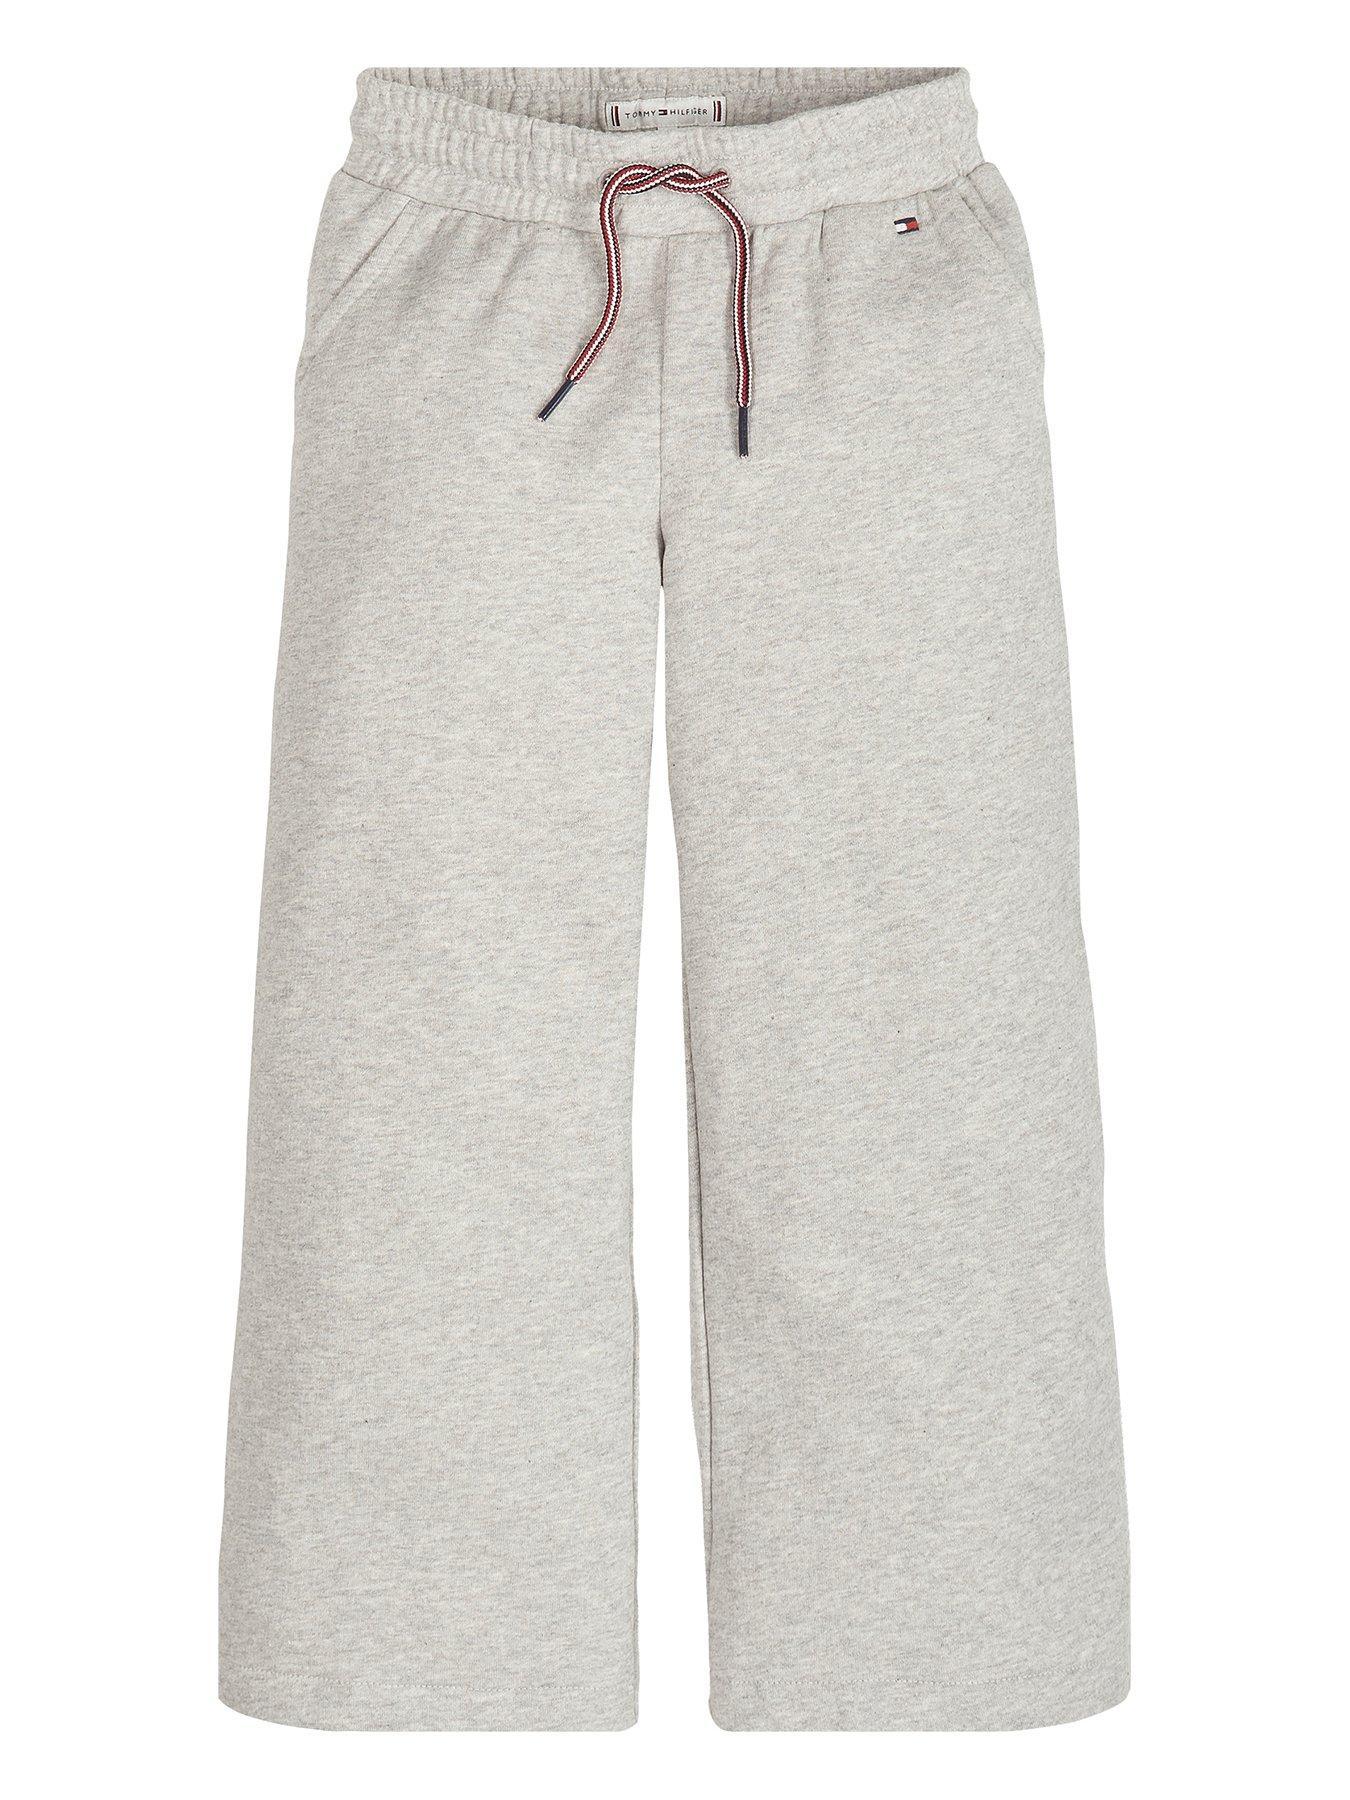 58c81bea012 Clothing Sets Tommy Hilfiger Boys Toddler 2 Pieces Long Sleeves Shirt  Shorts Set